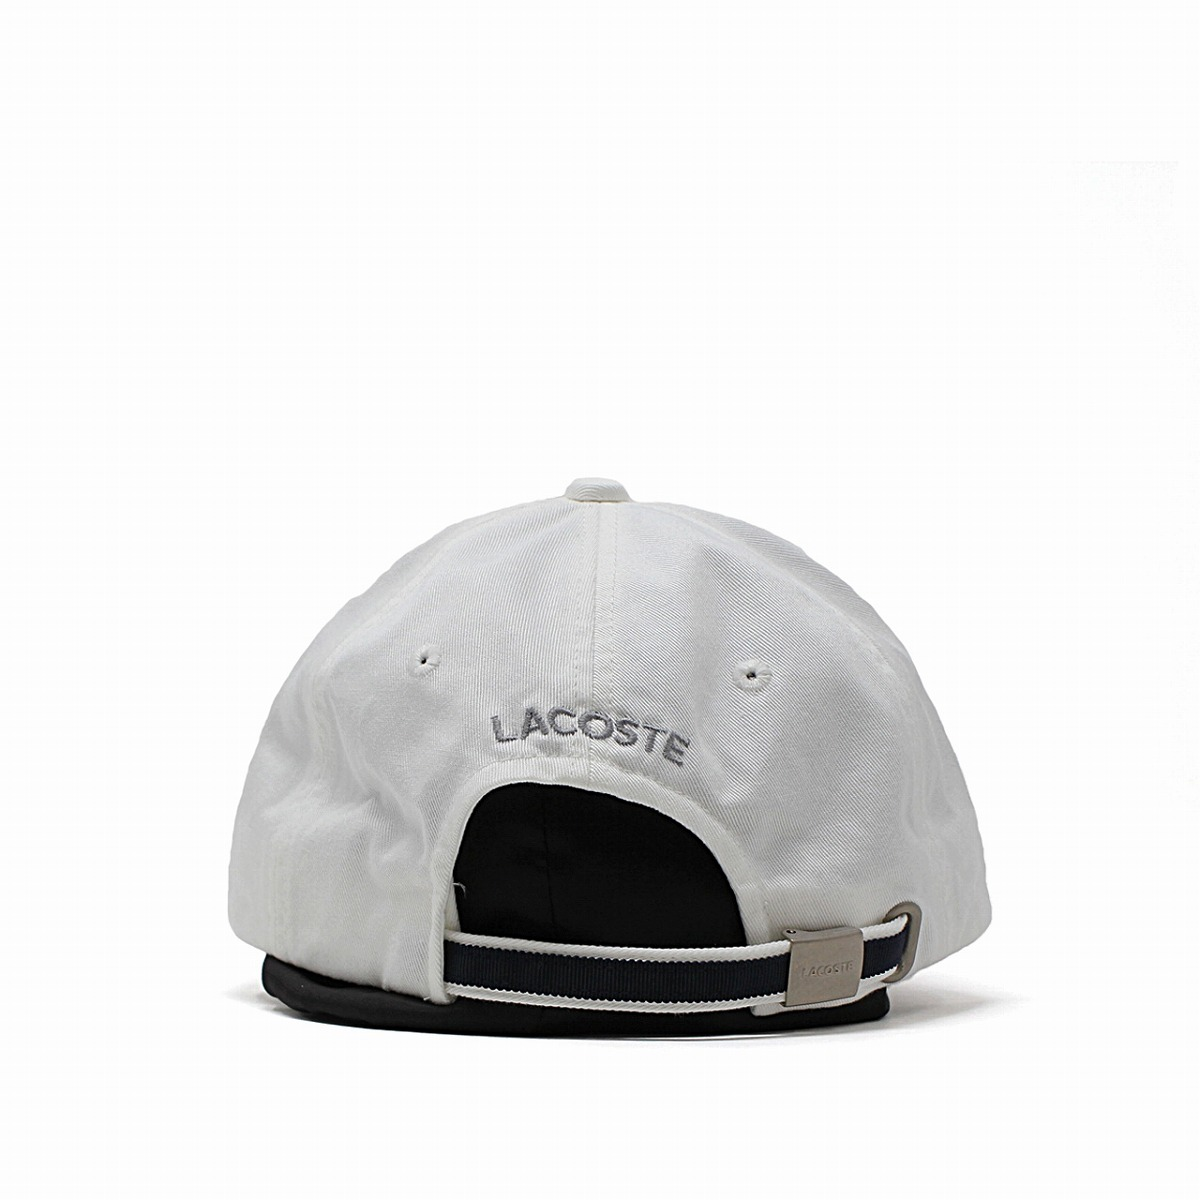 ELEHELM HAT STORE  Product made in Lacoste cap men LACOSTE hat ... 62ef6a135f5d